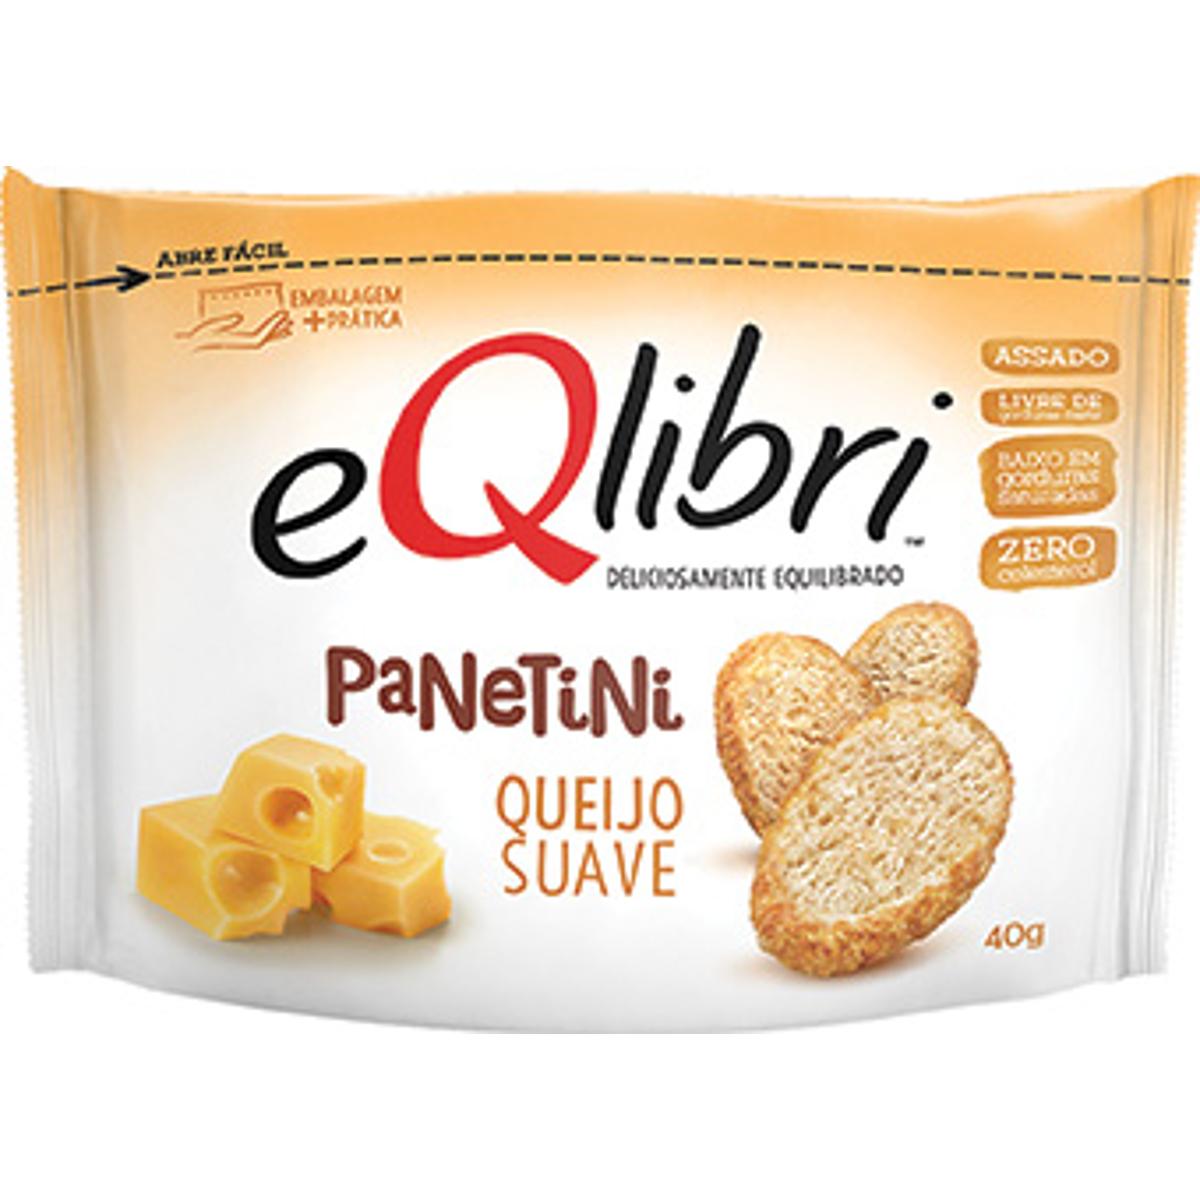 Biscoito salgado panetini sabor queijo suave 40g Eqlibri pacote PCT